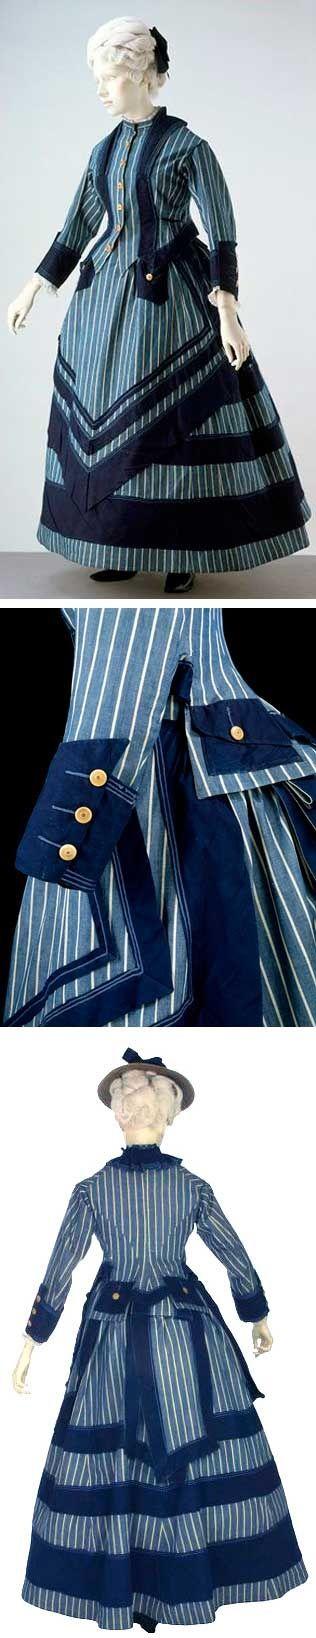 Silk-Trimmed Cotton Dress | ca. 1872 | Victoria & Albert Museum